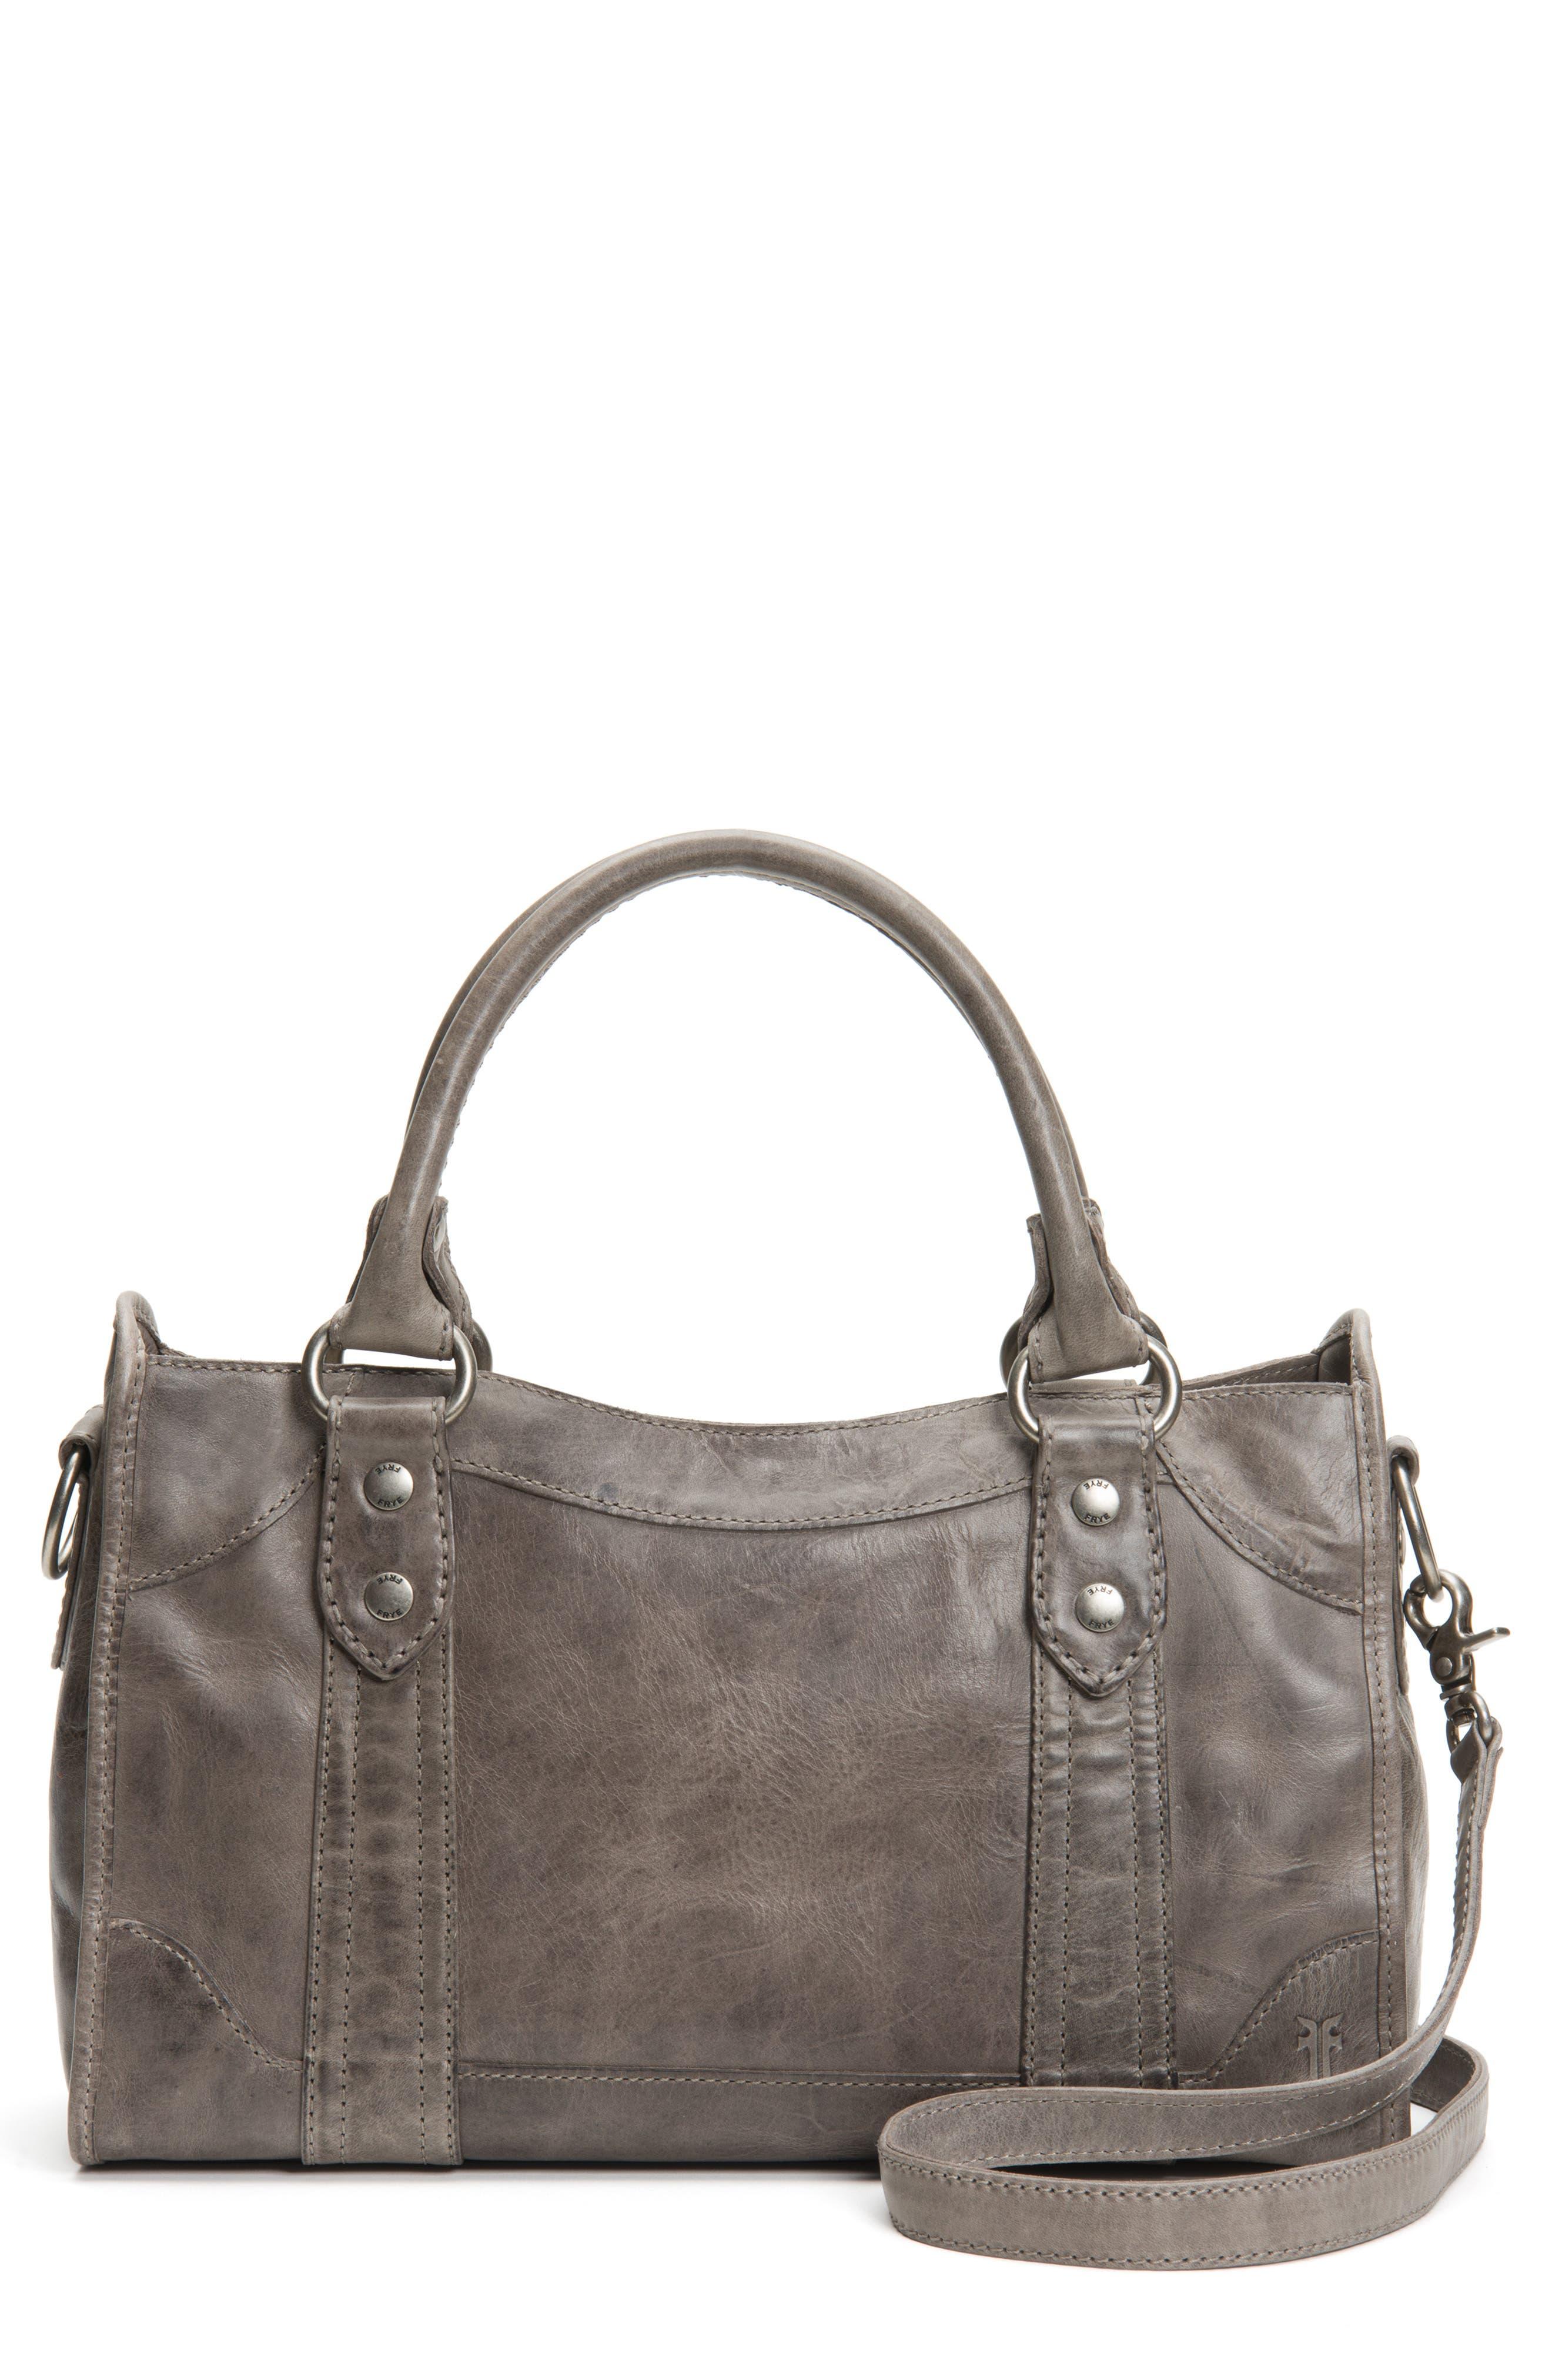 FRYE,                             'Melissa' Washed Leather Satchel,                             Alternate thumbnail 2, color,                             ICE